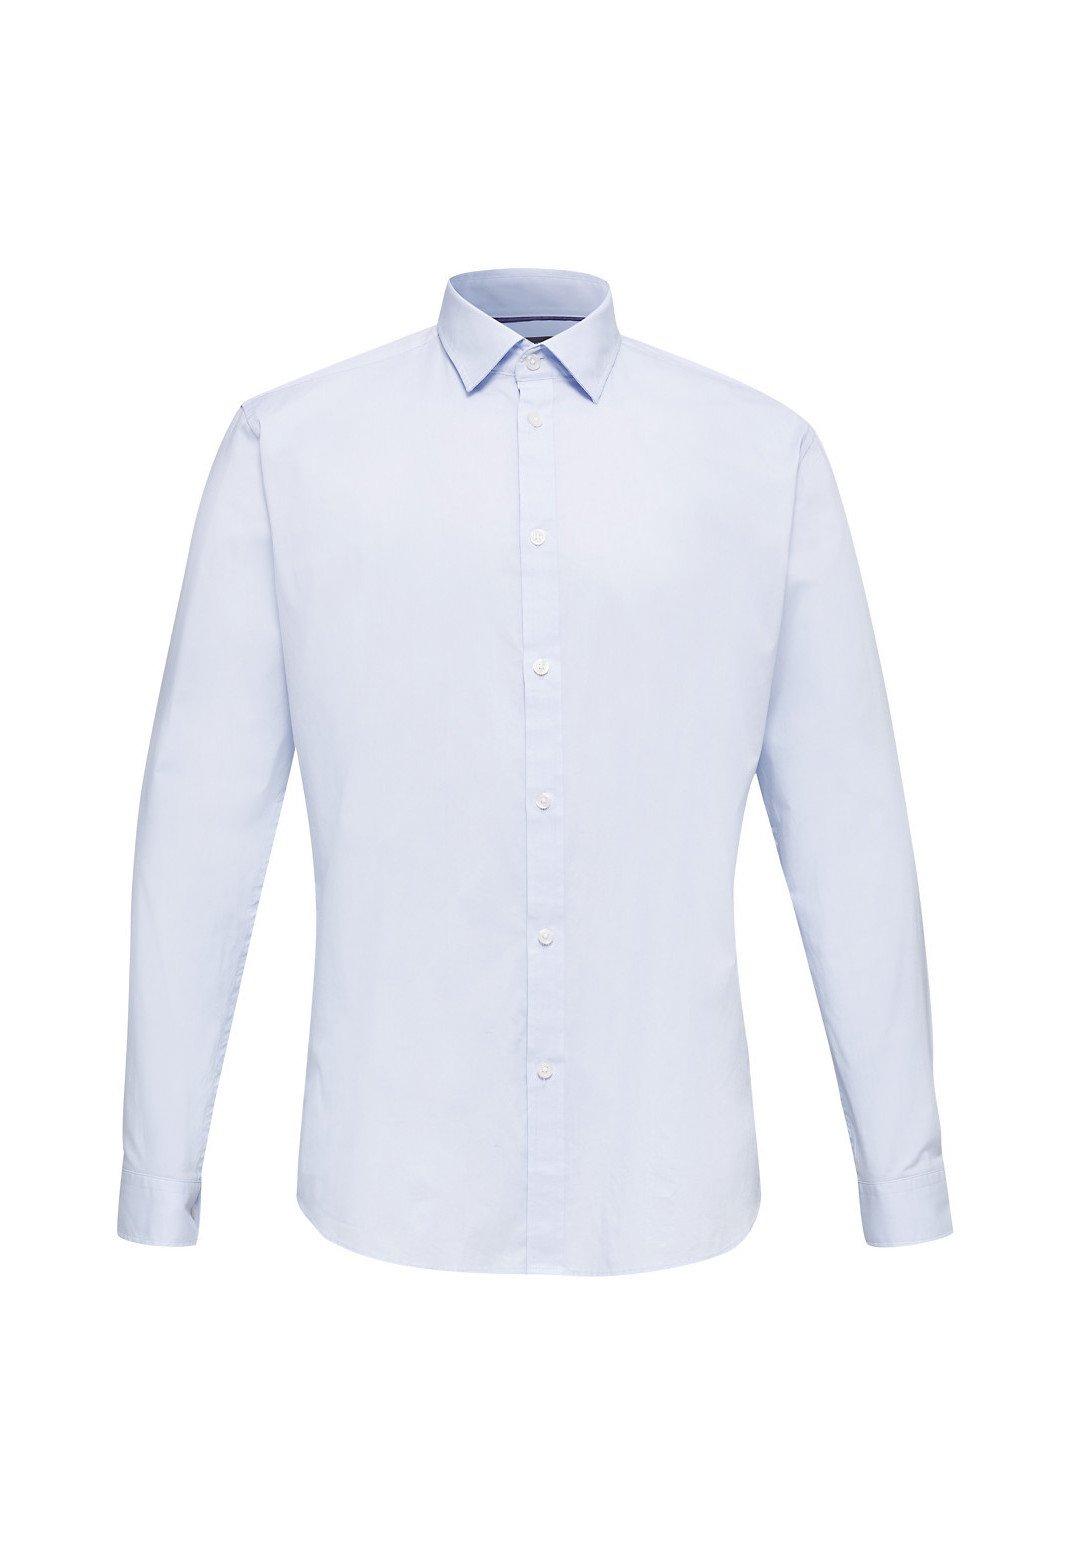 Esprit Chemise - light blue